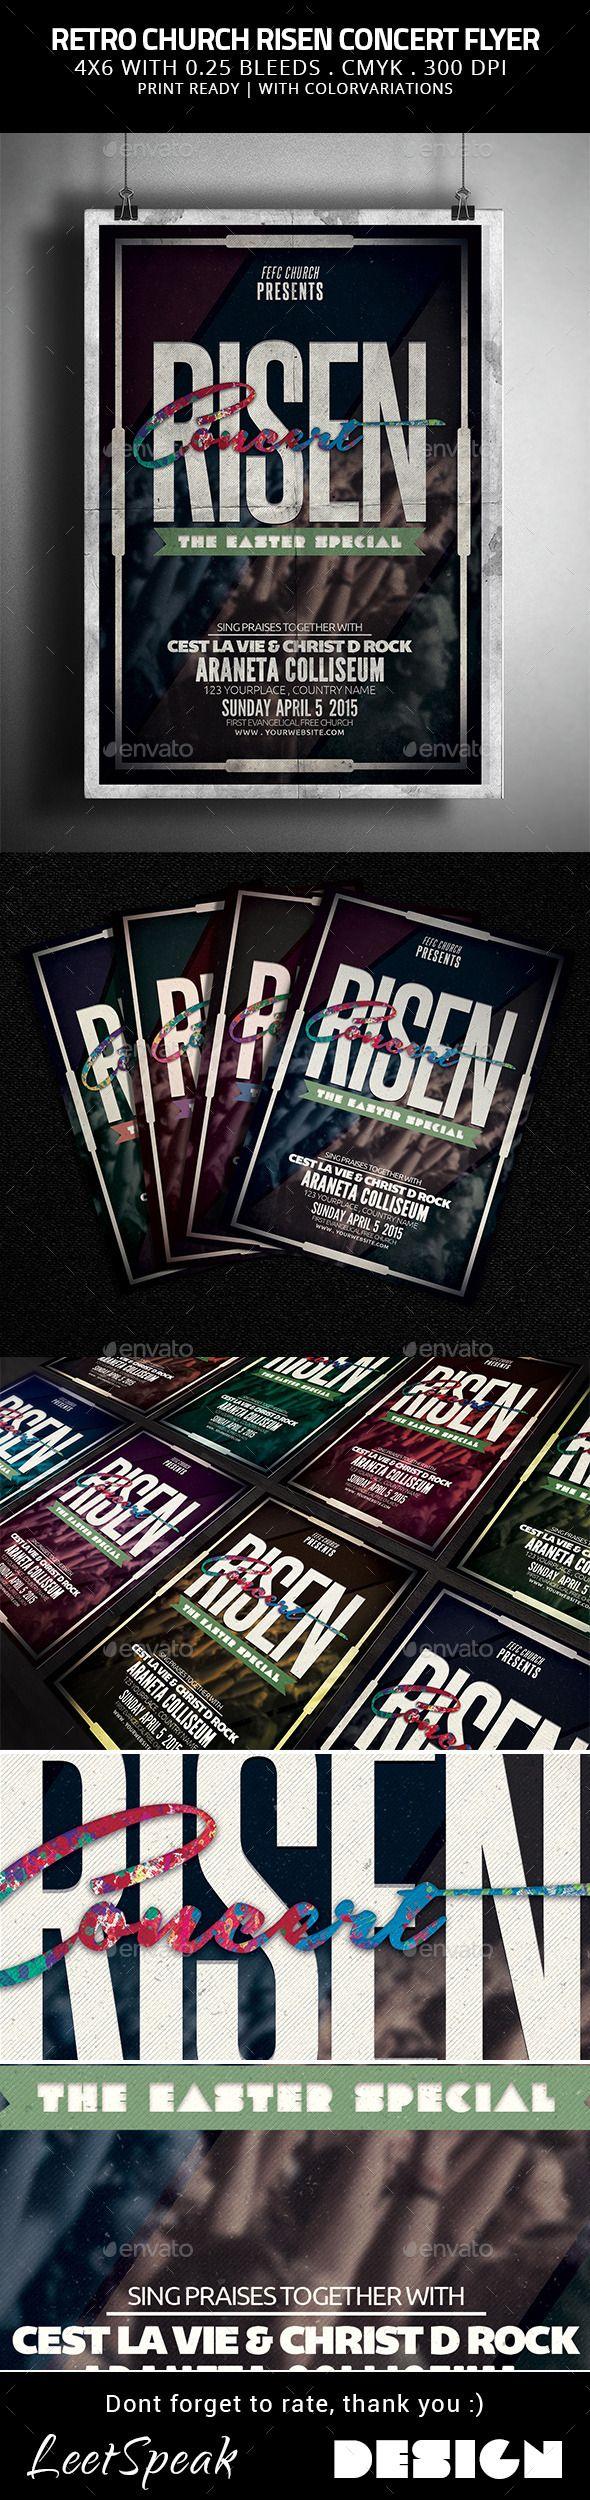 Retro Church Risen Concert Flyer | Concert flyer, Print fonts and ...